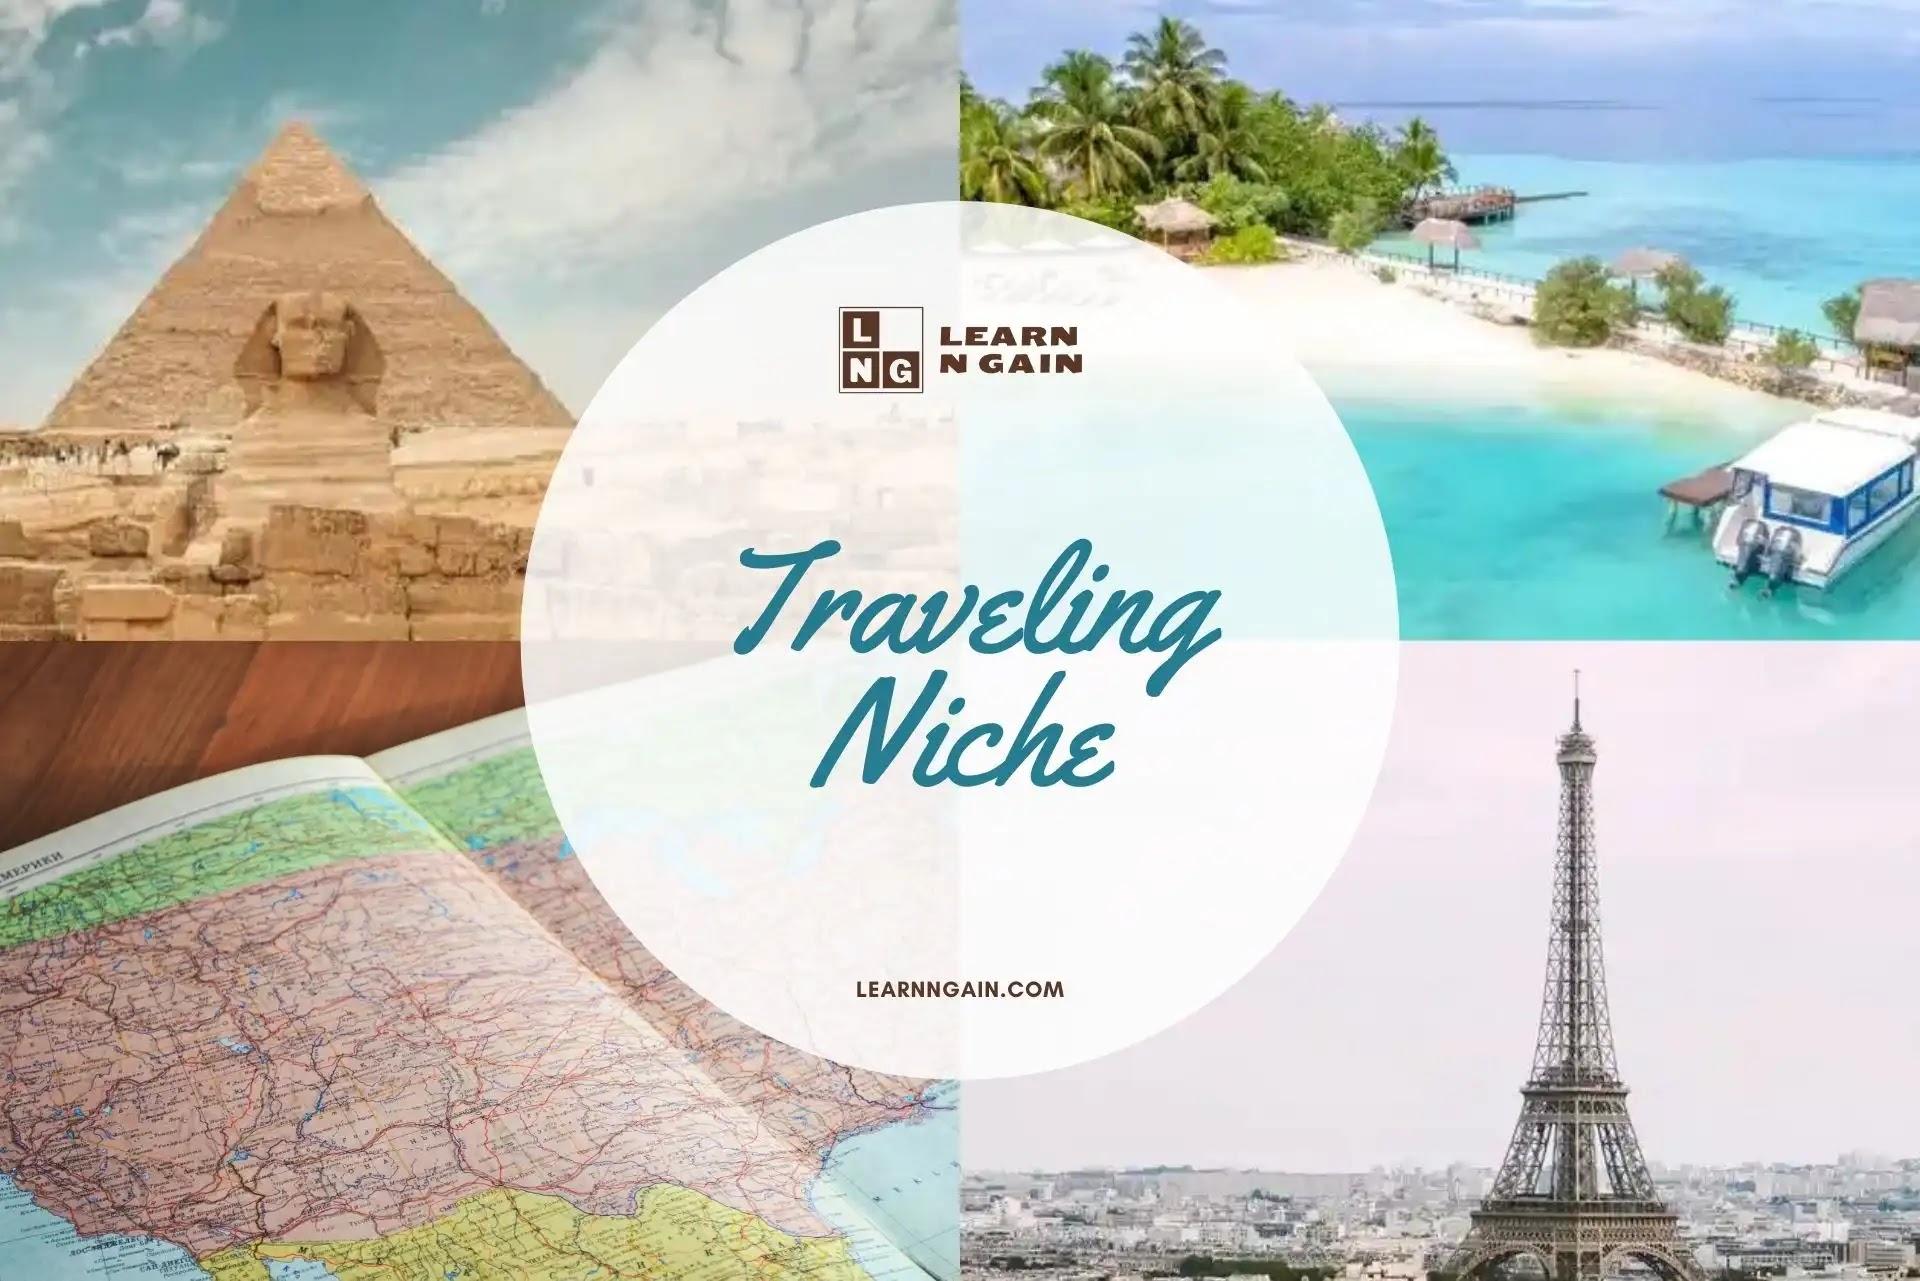 Traveling Niche